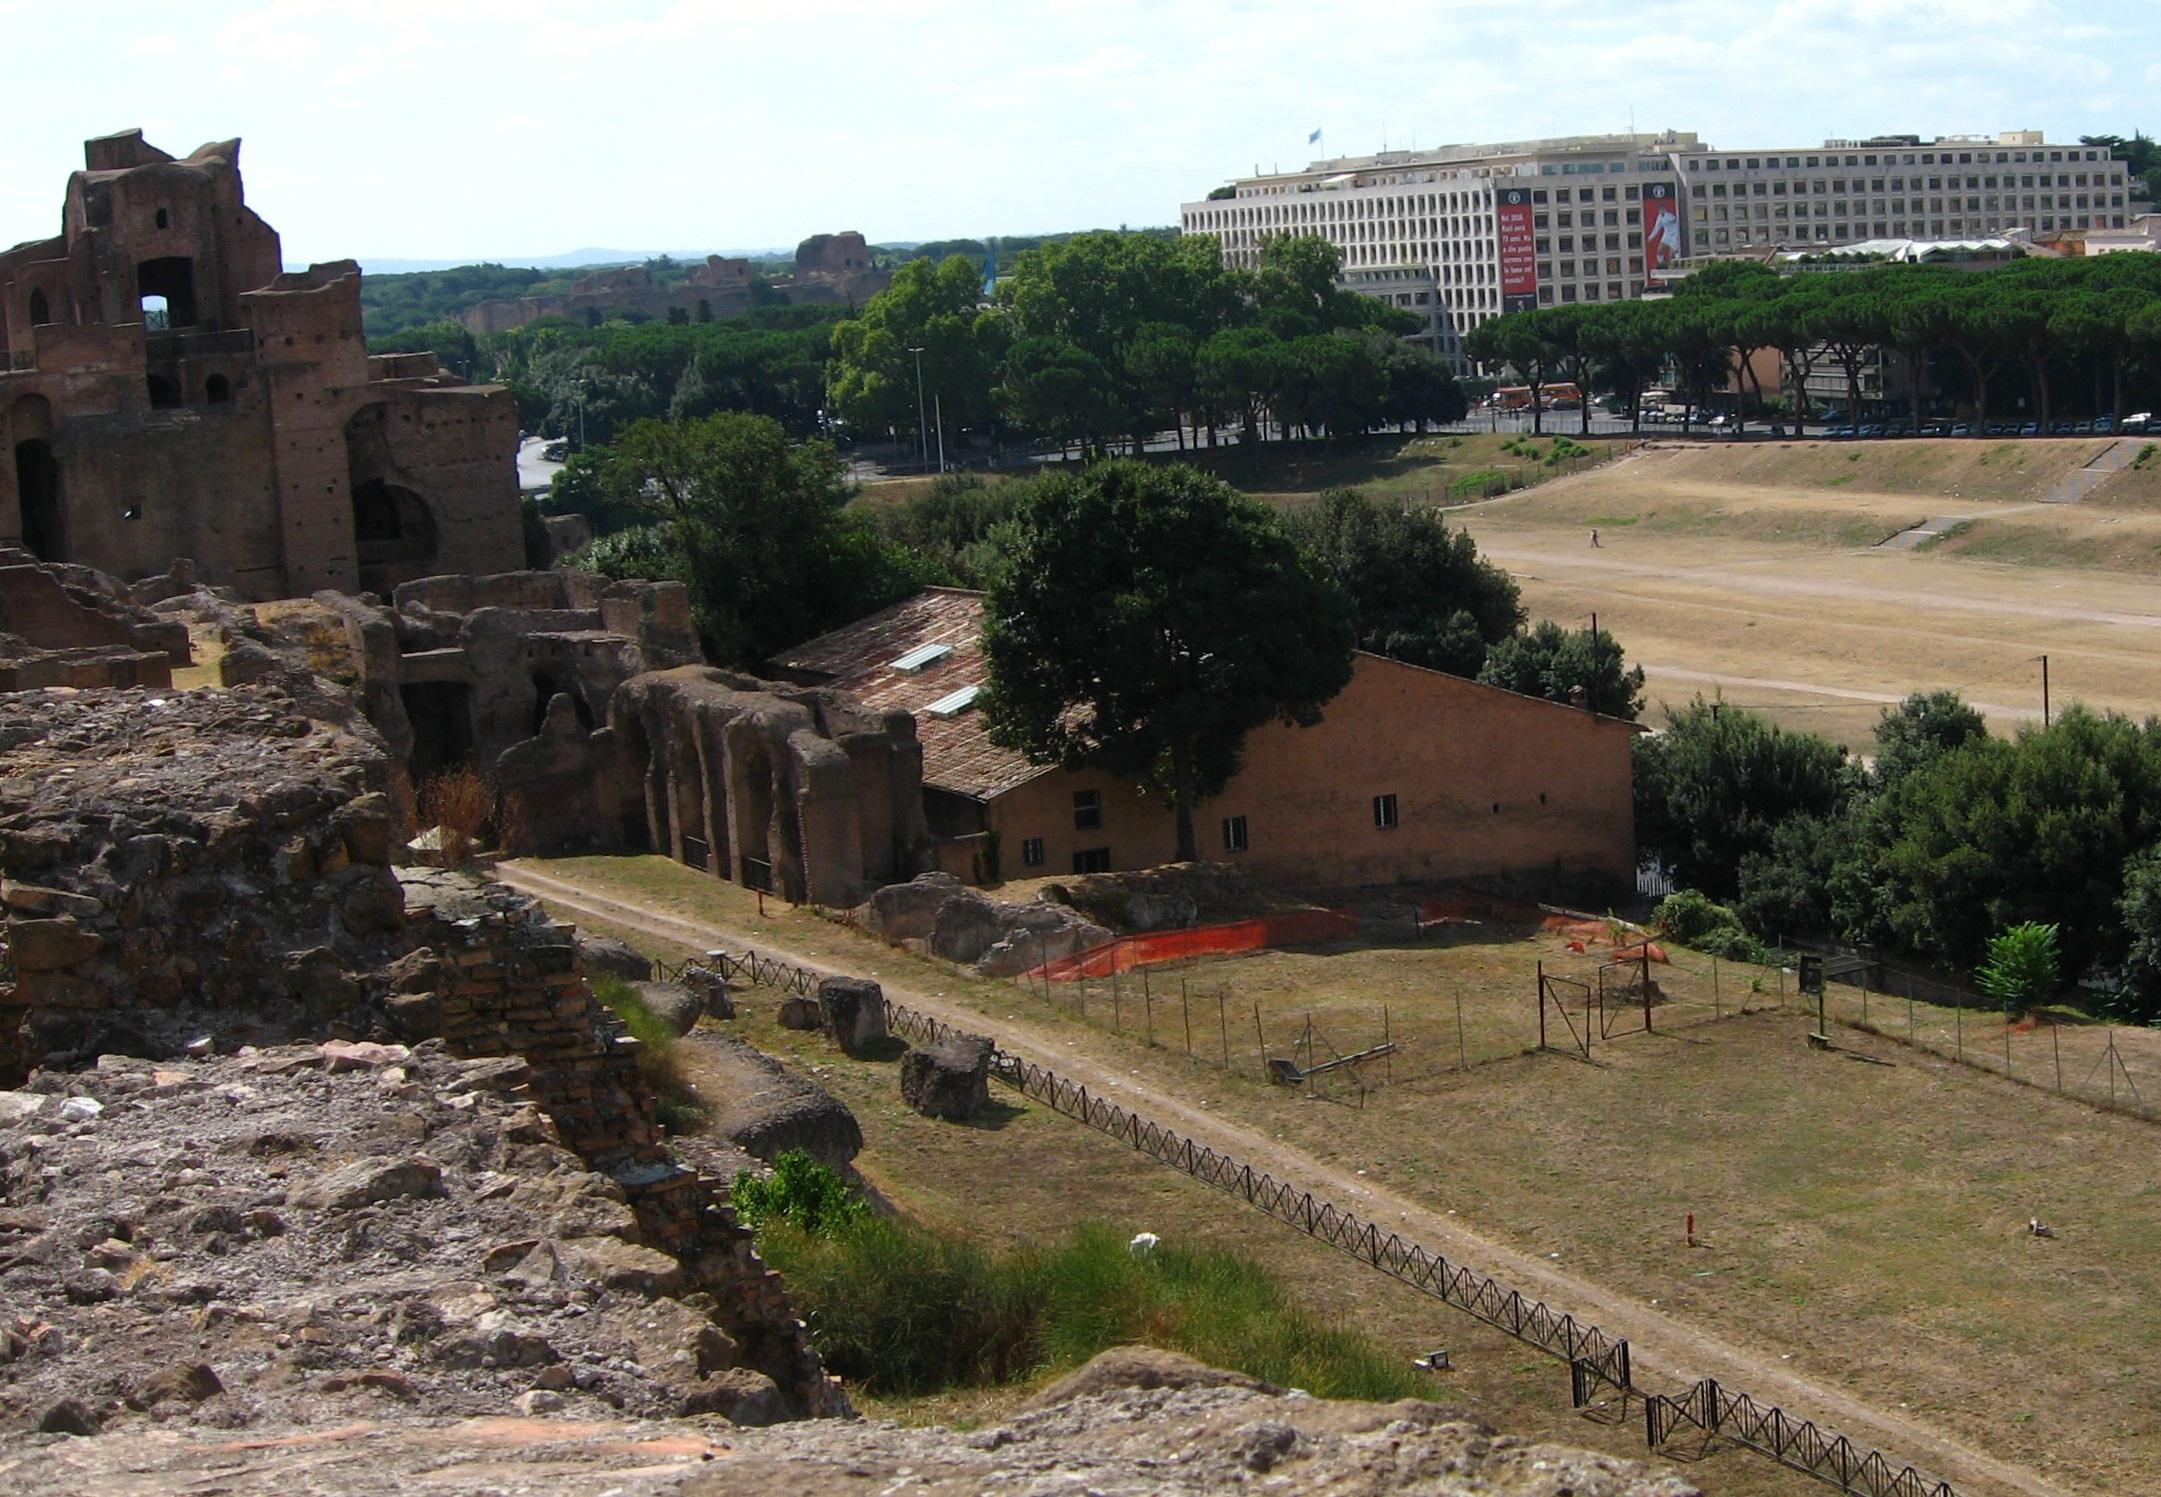 Circus Maximus : WikiPedia